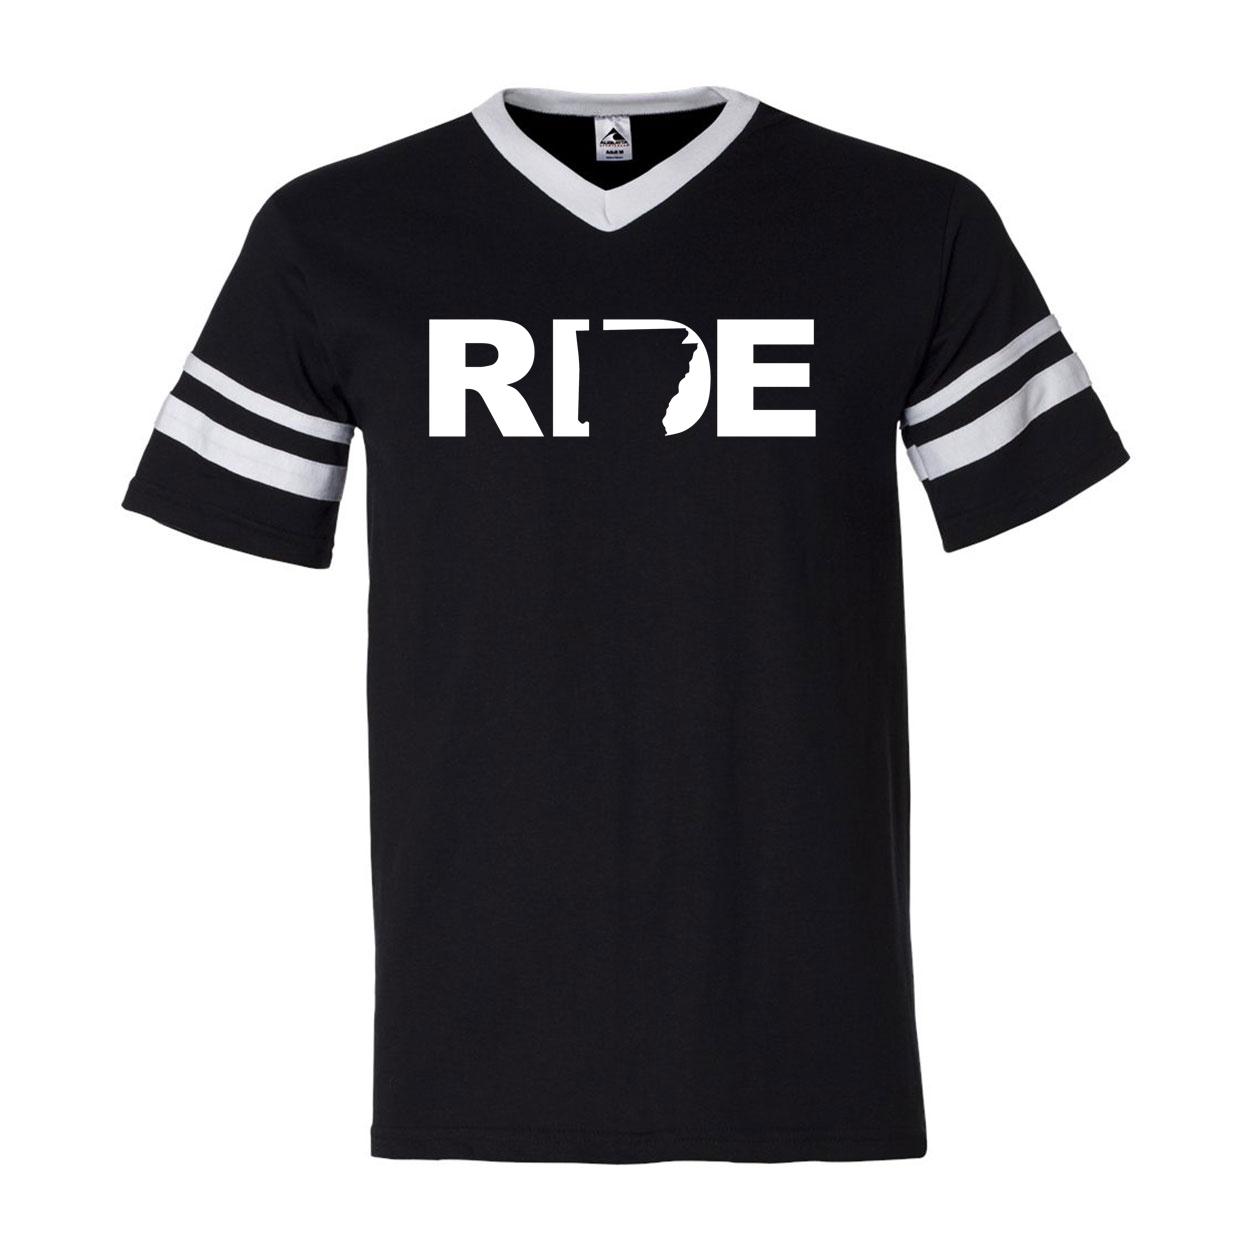 Ride Arkansas Classic Premium Striped Jersey T-Shirt Black/White (White Logo)